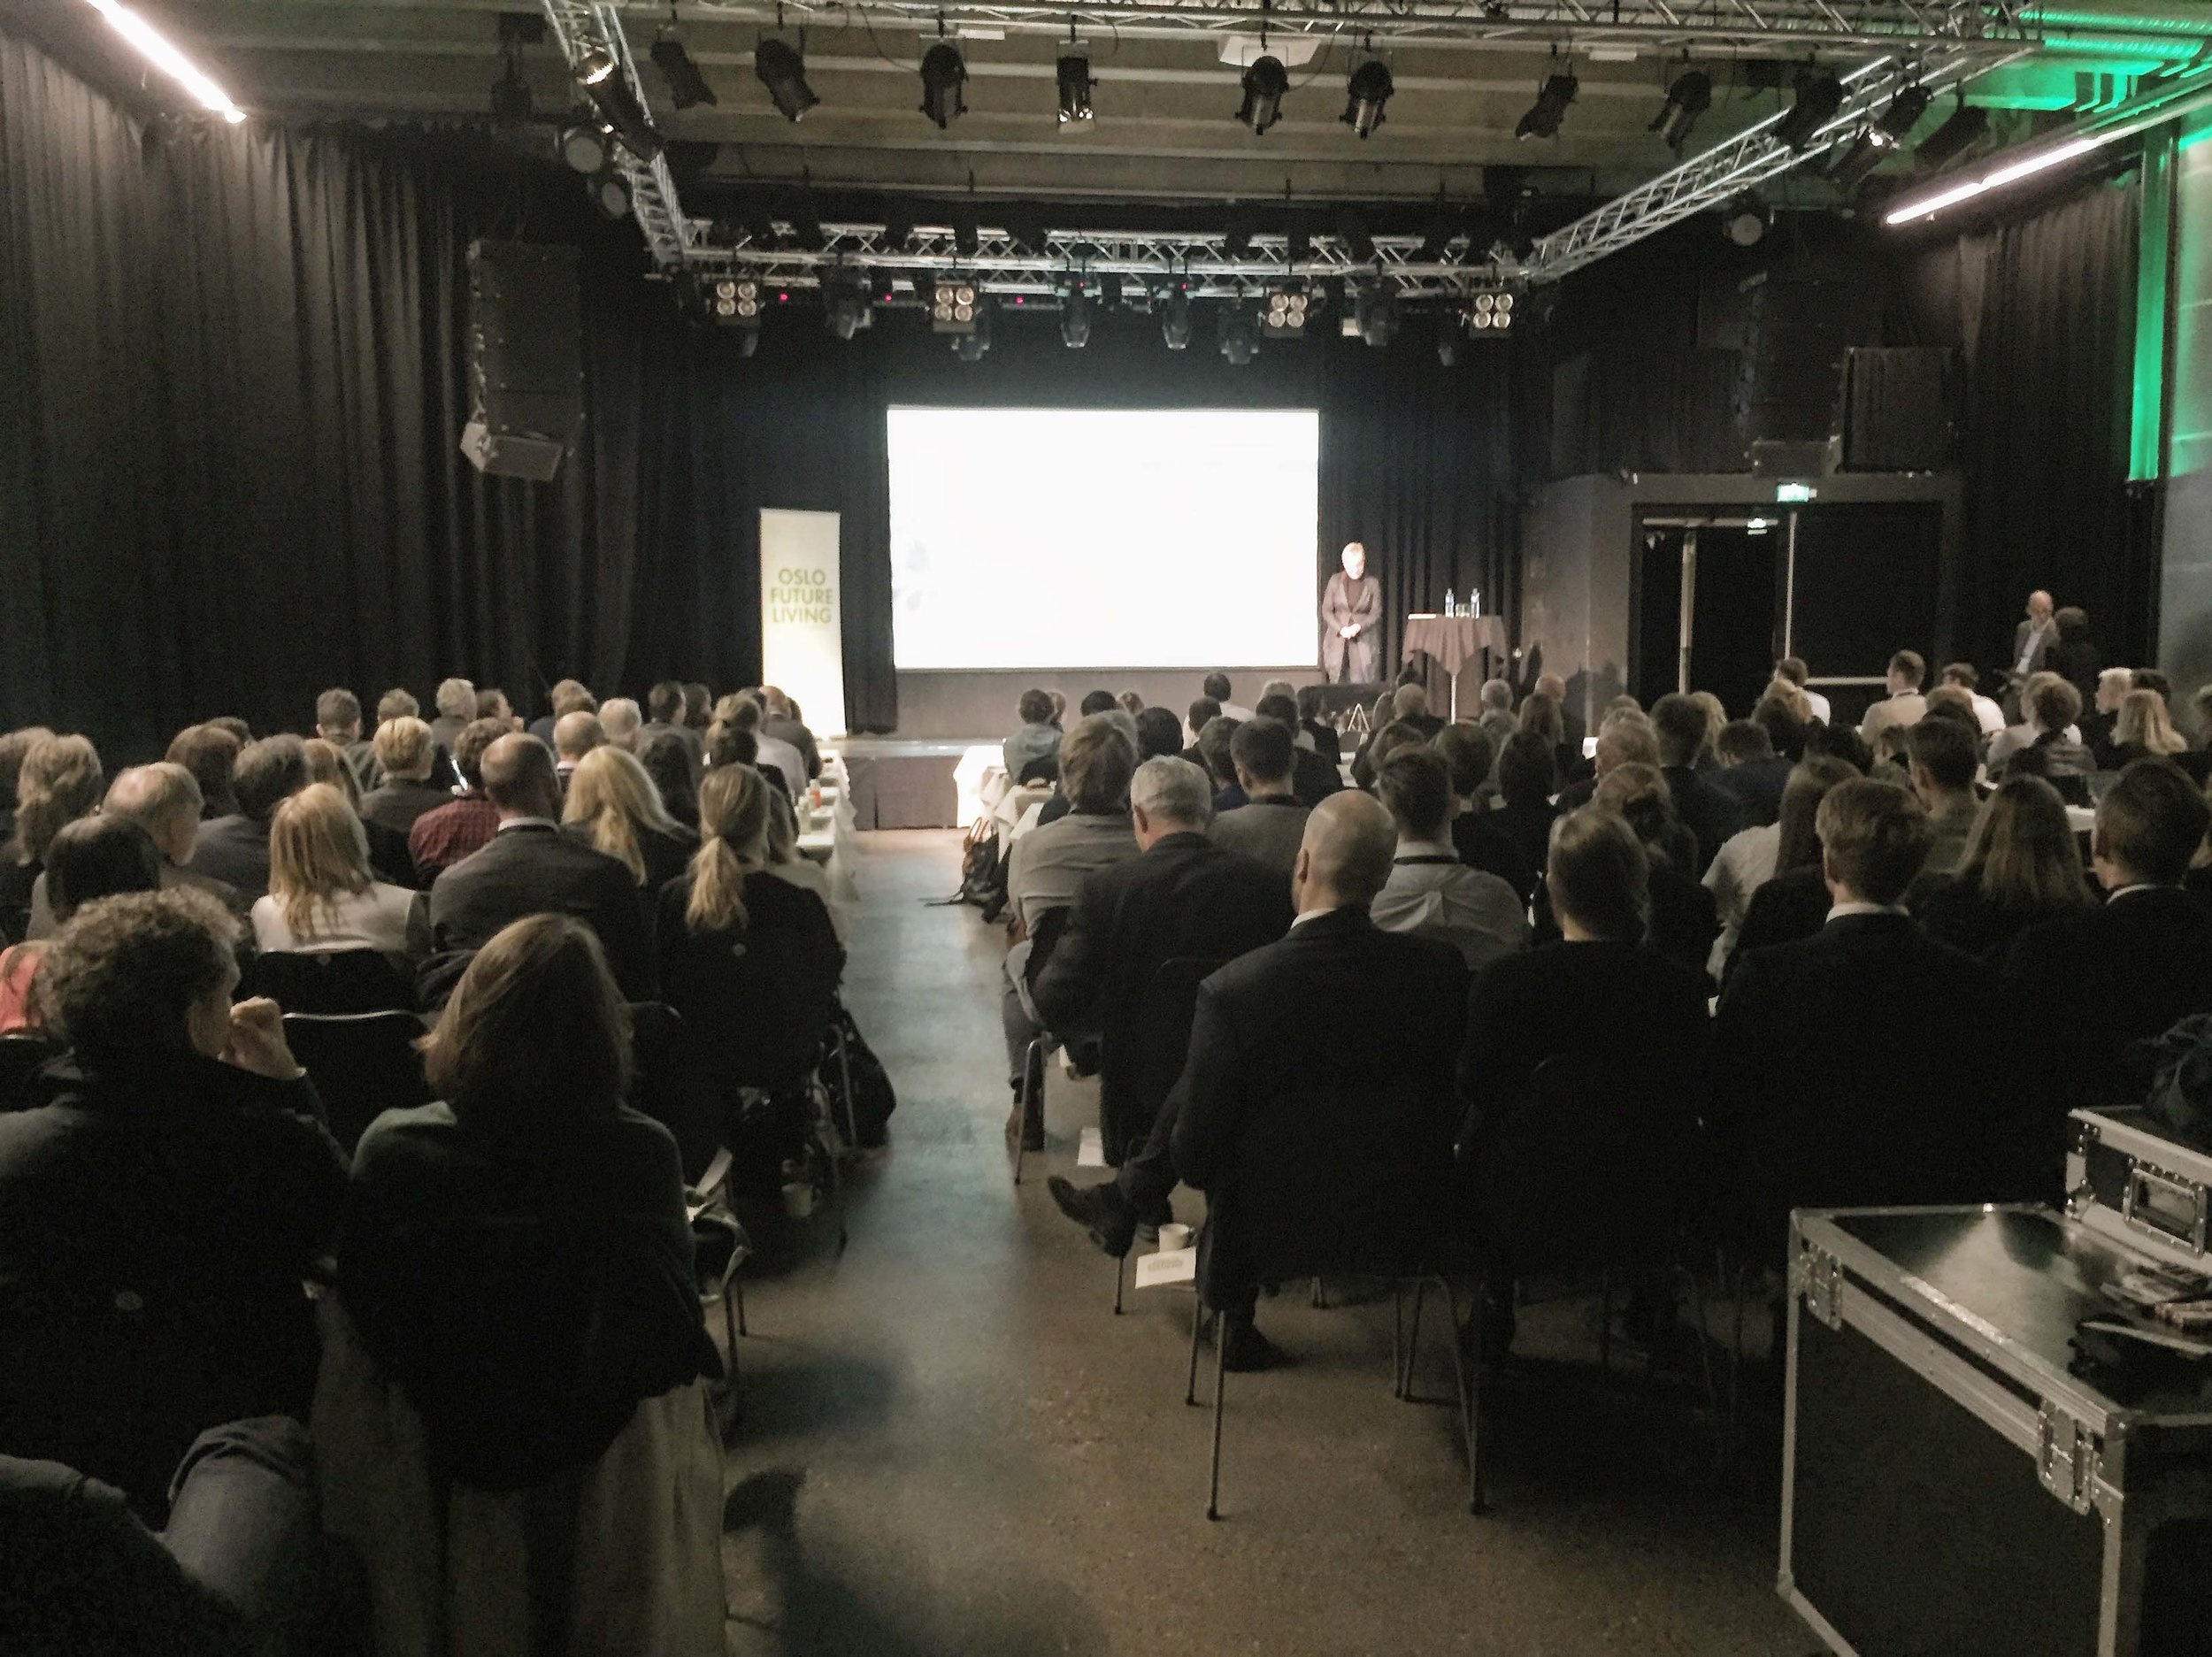 Speaker at the Oslo Future Living - 11.05.2017 - Vulkan, Oslo - Tin will be presenting,